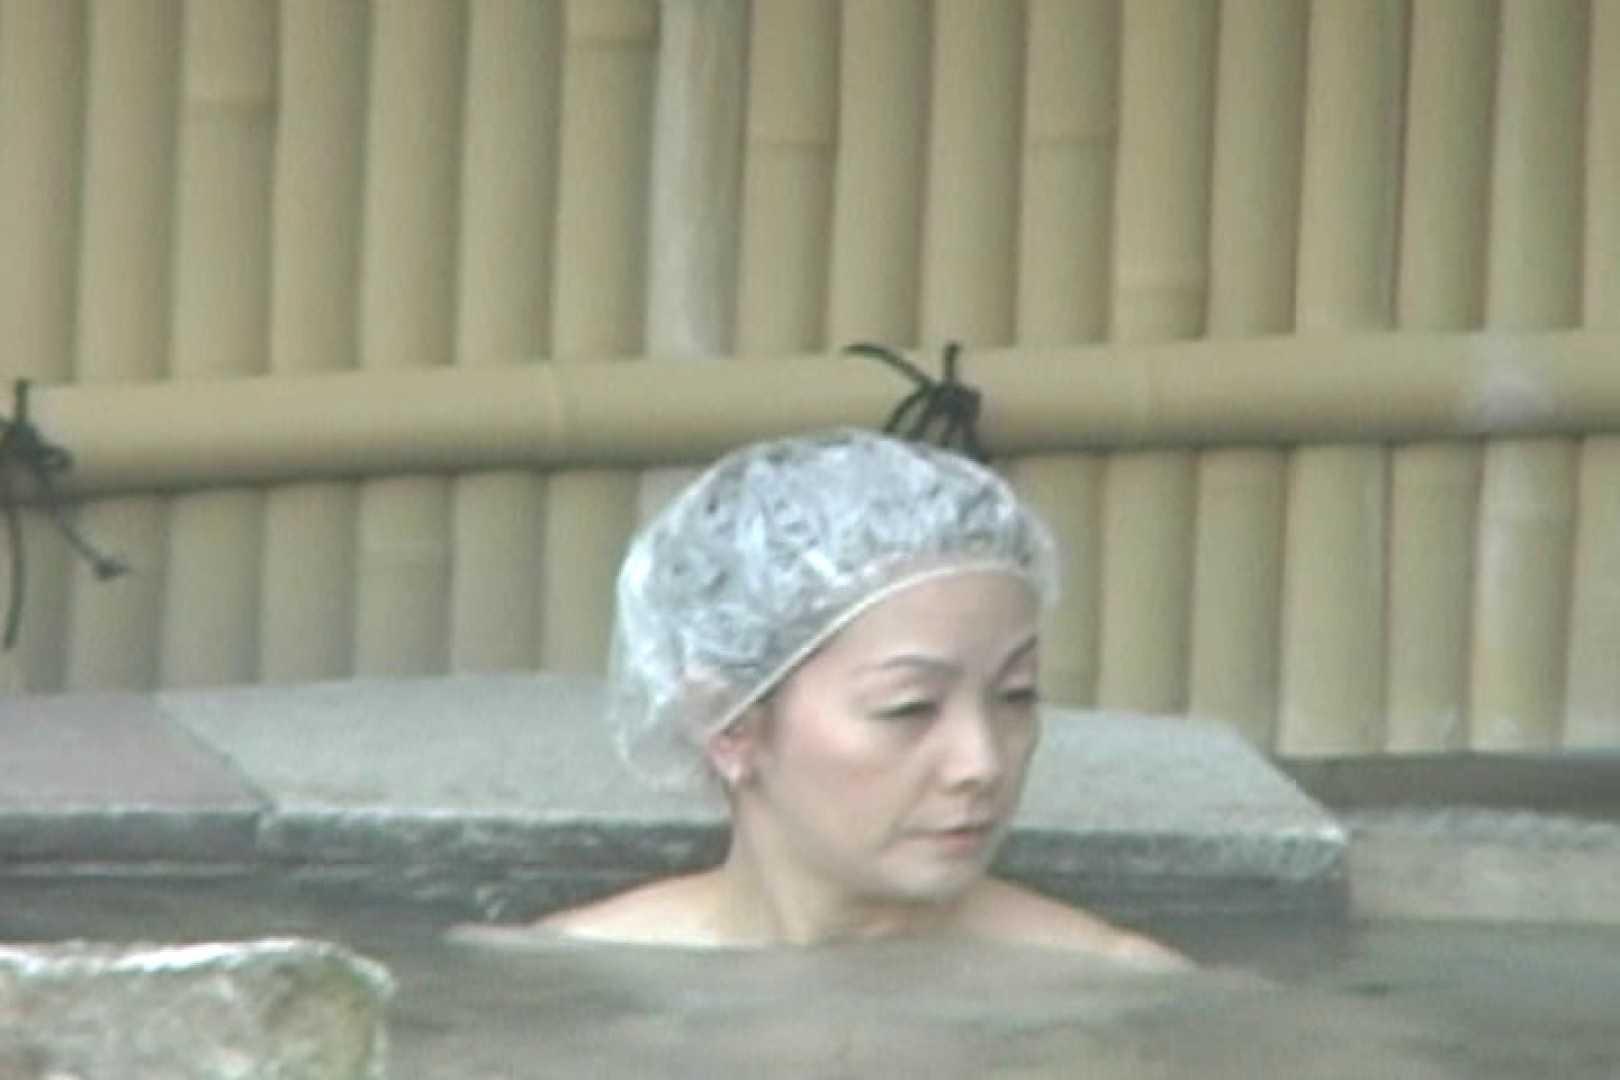 Aquaな露天風呂Vol.592 露天  106連発 4